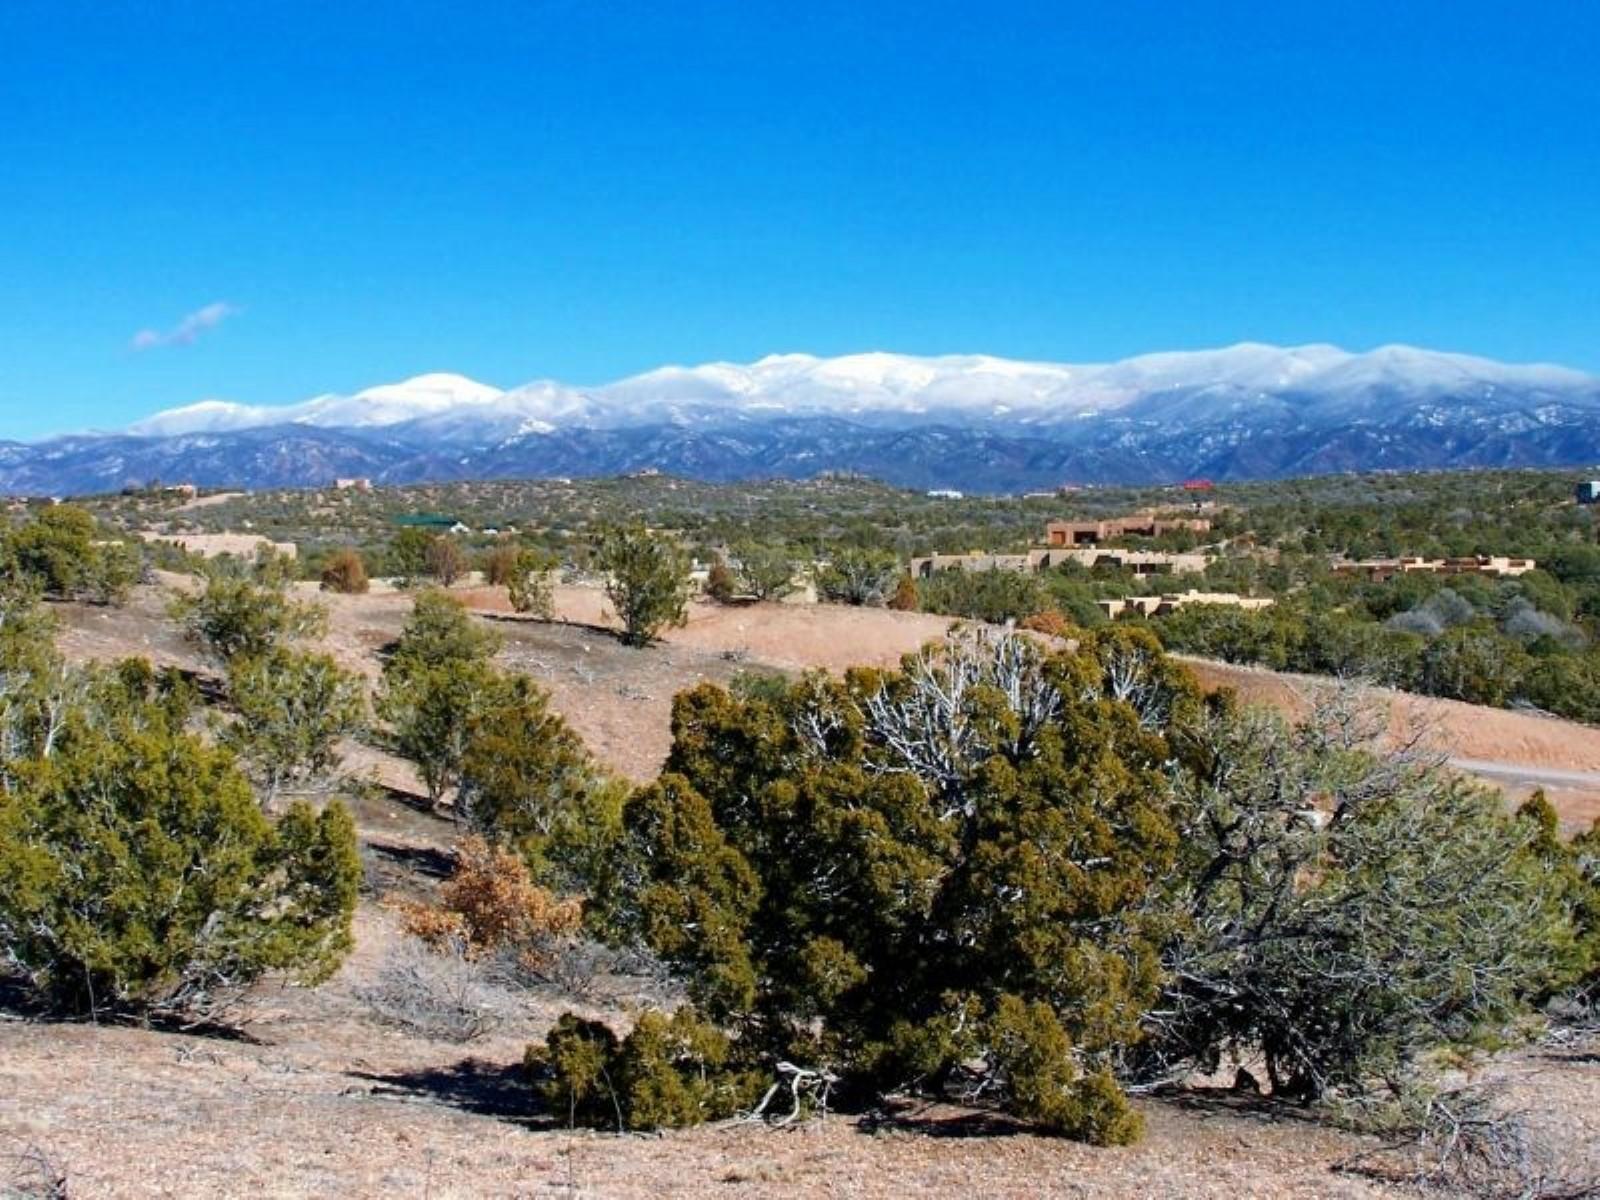 Land for Sale at 46 Stardancer 46 Stardancer Santa Fe, New Mexico 87506 United States